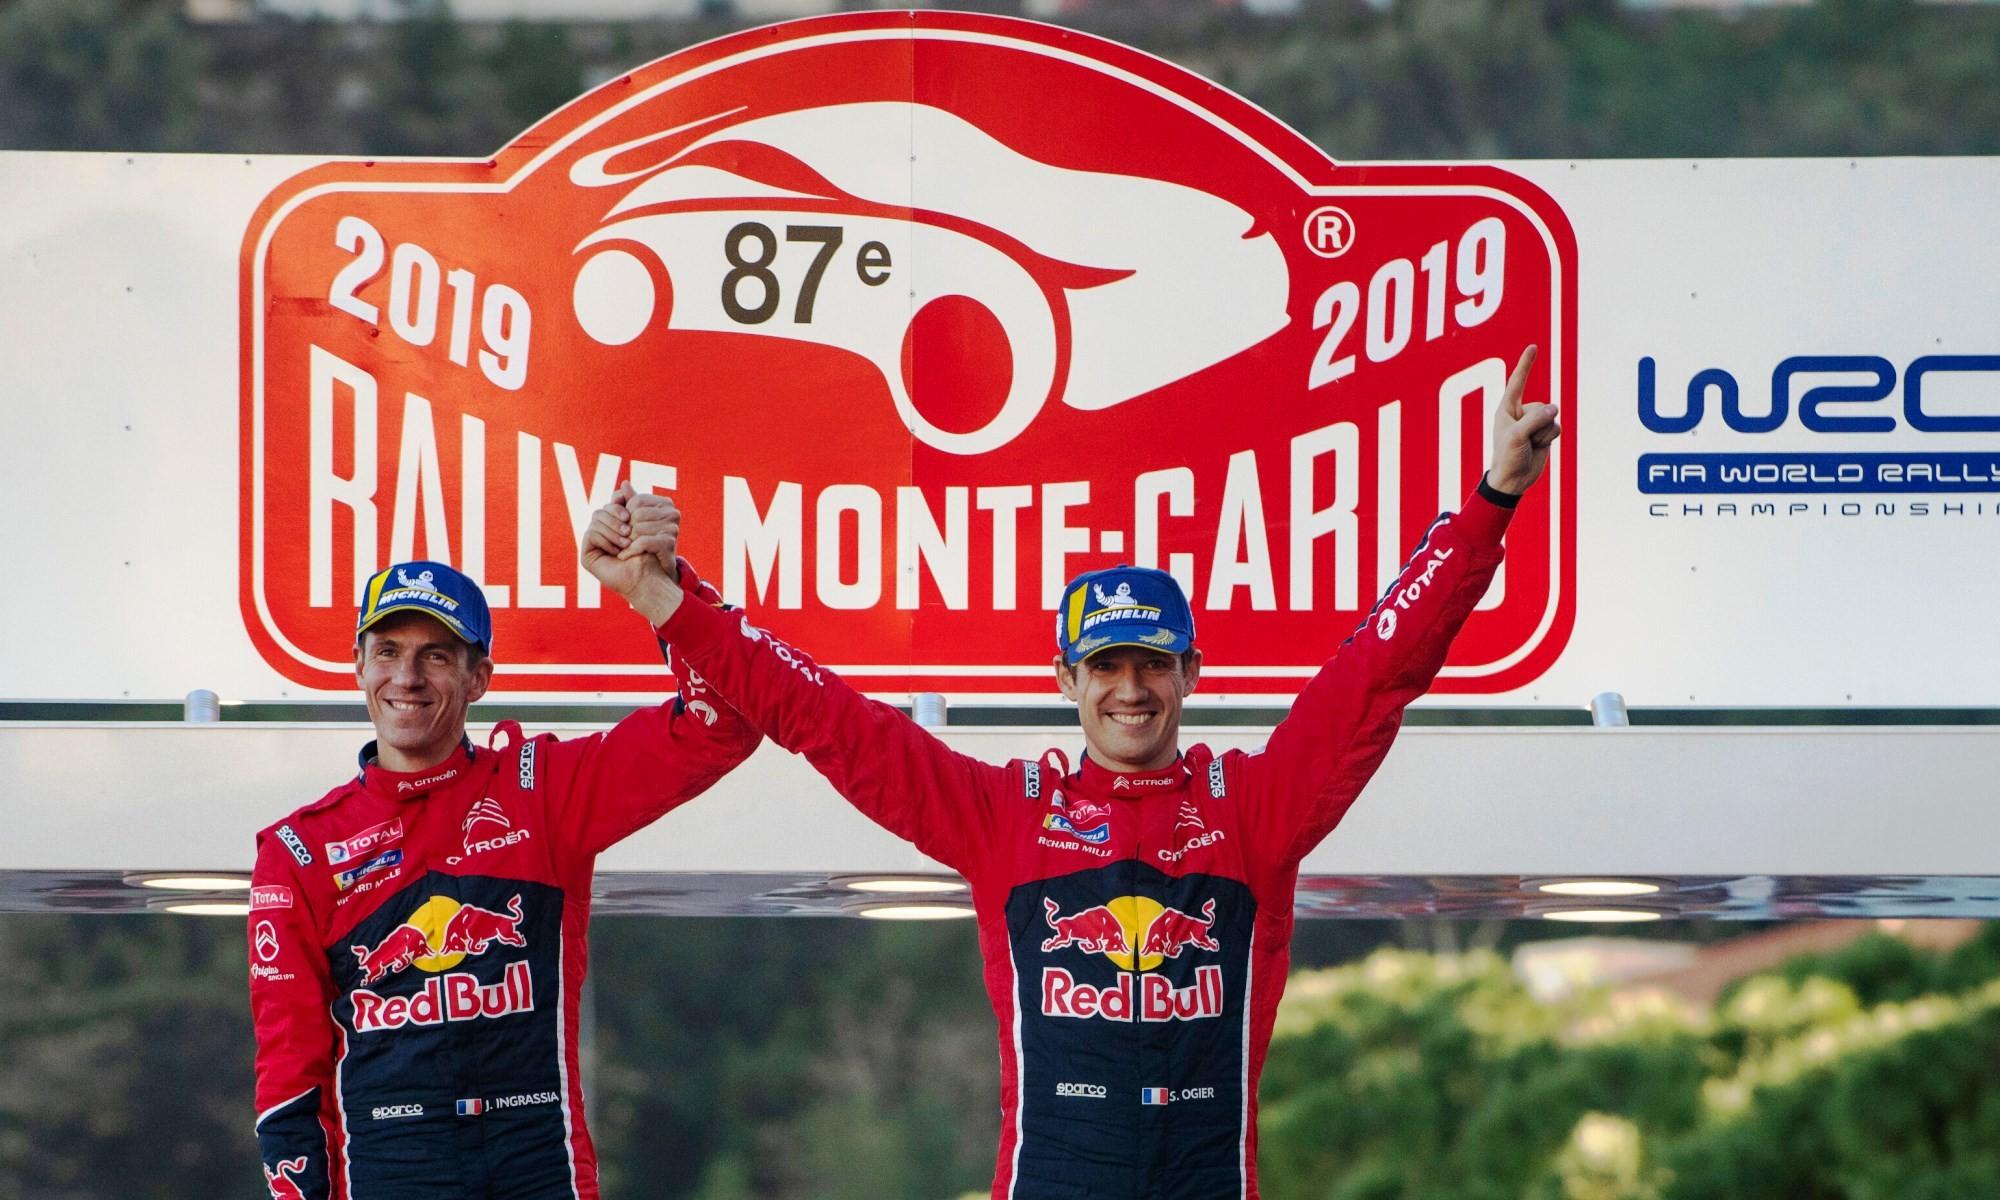 The winners Sebastien Ogier and Julien Ingrassia